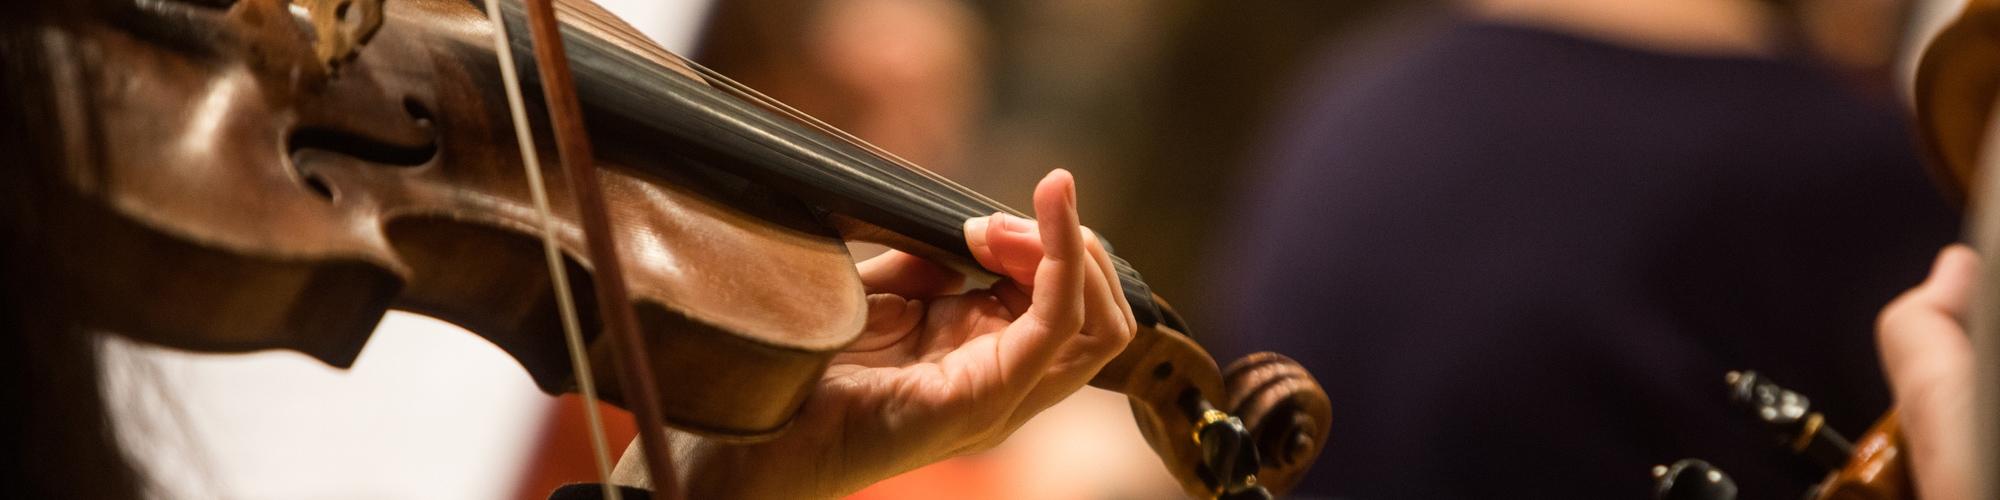 musico tocando violin